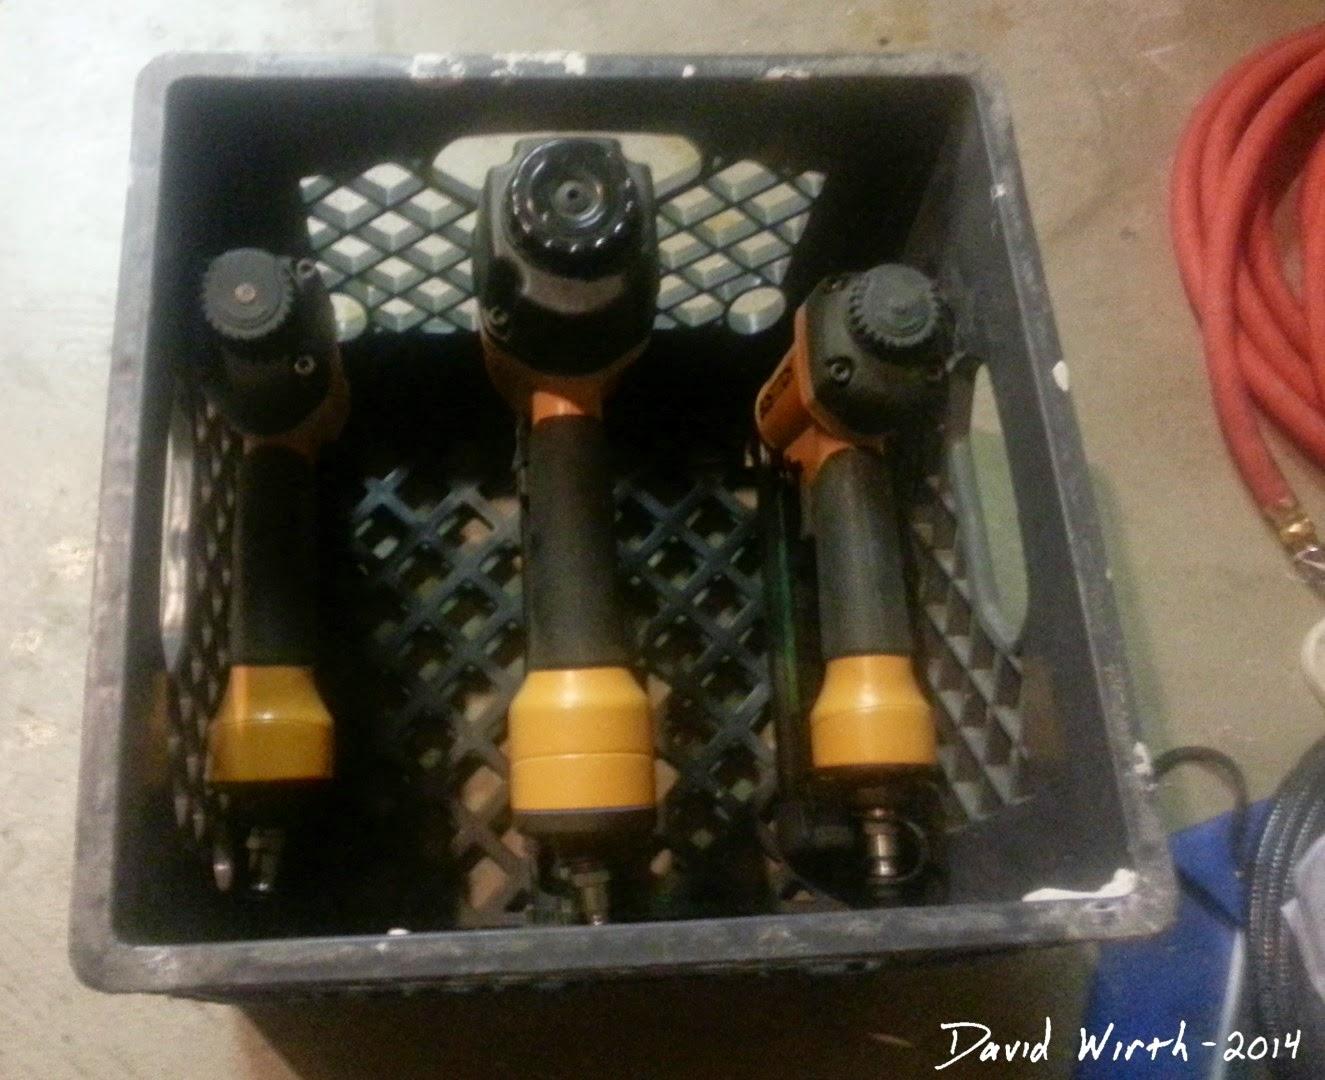 bostitch nail gun, milk crate, storage, protect